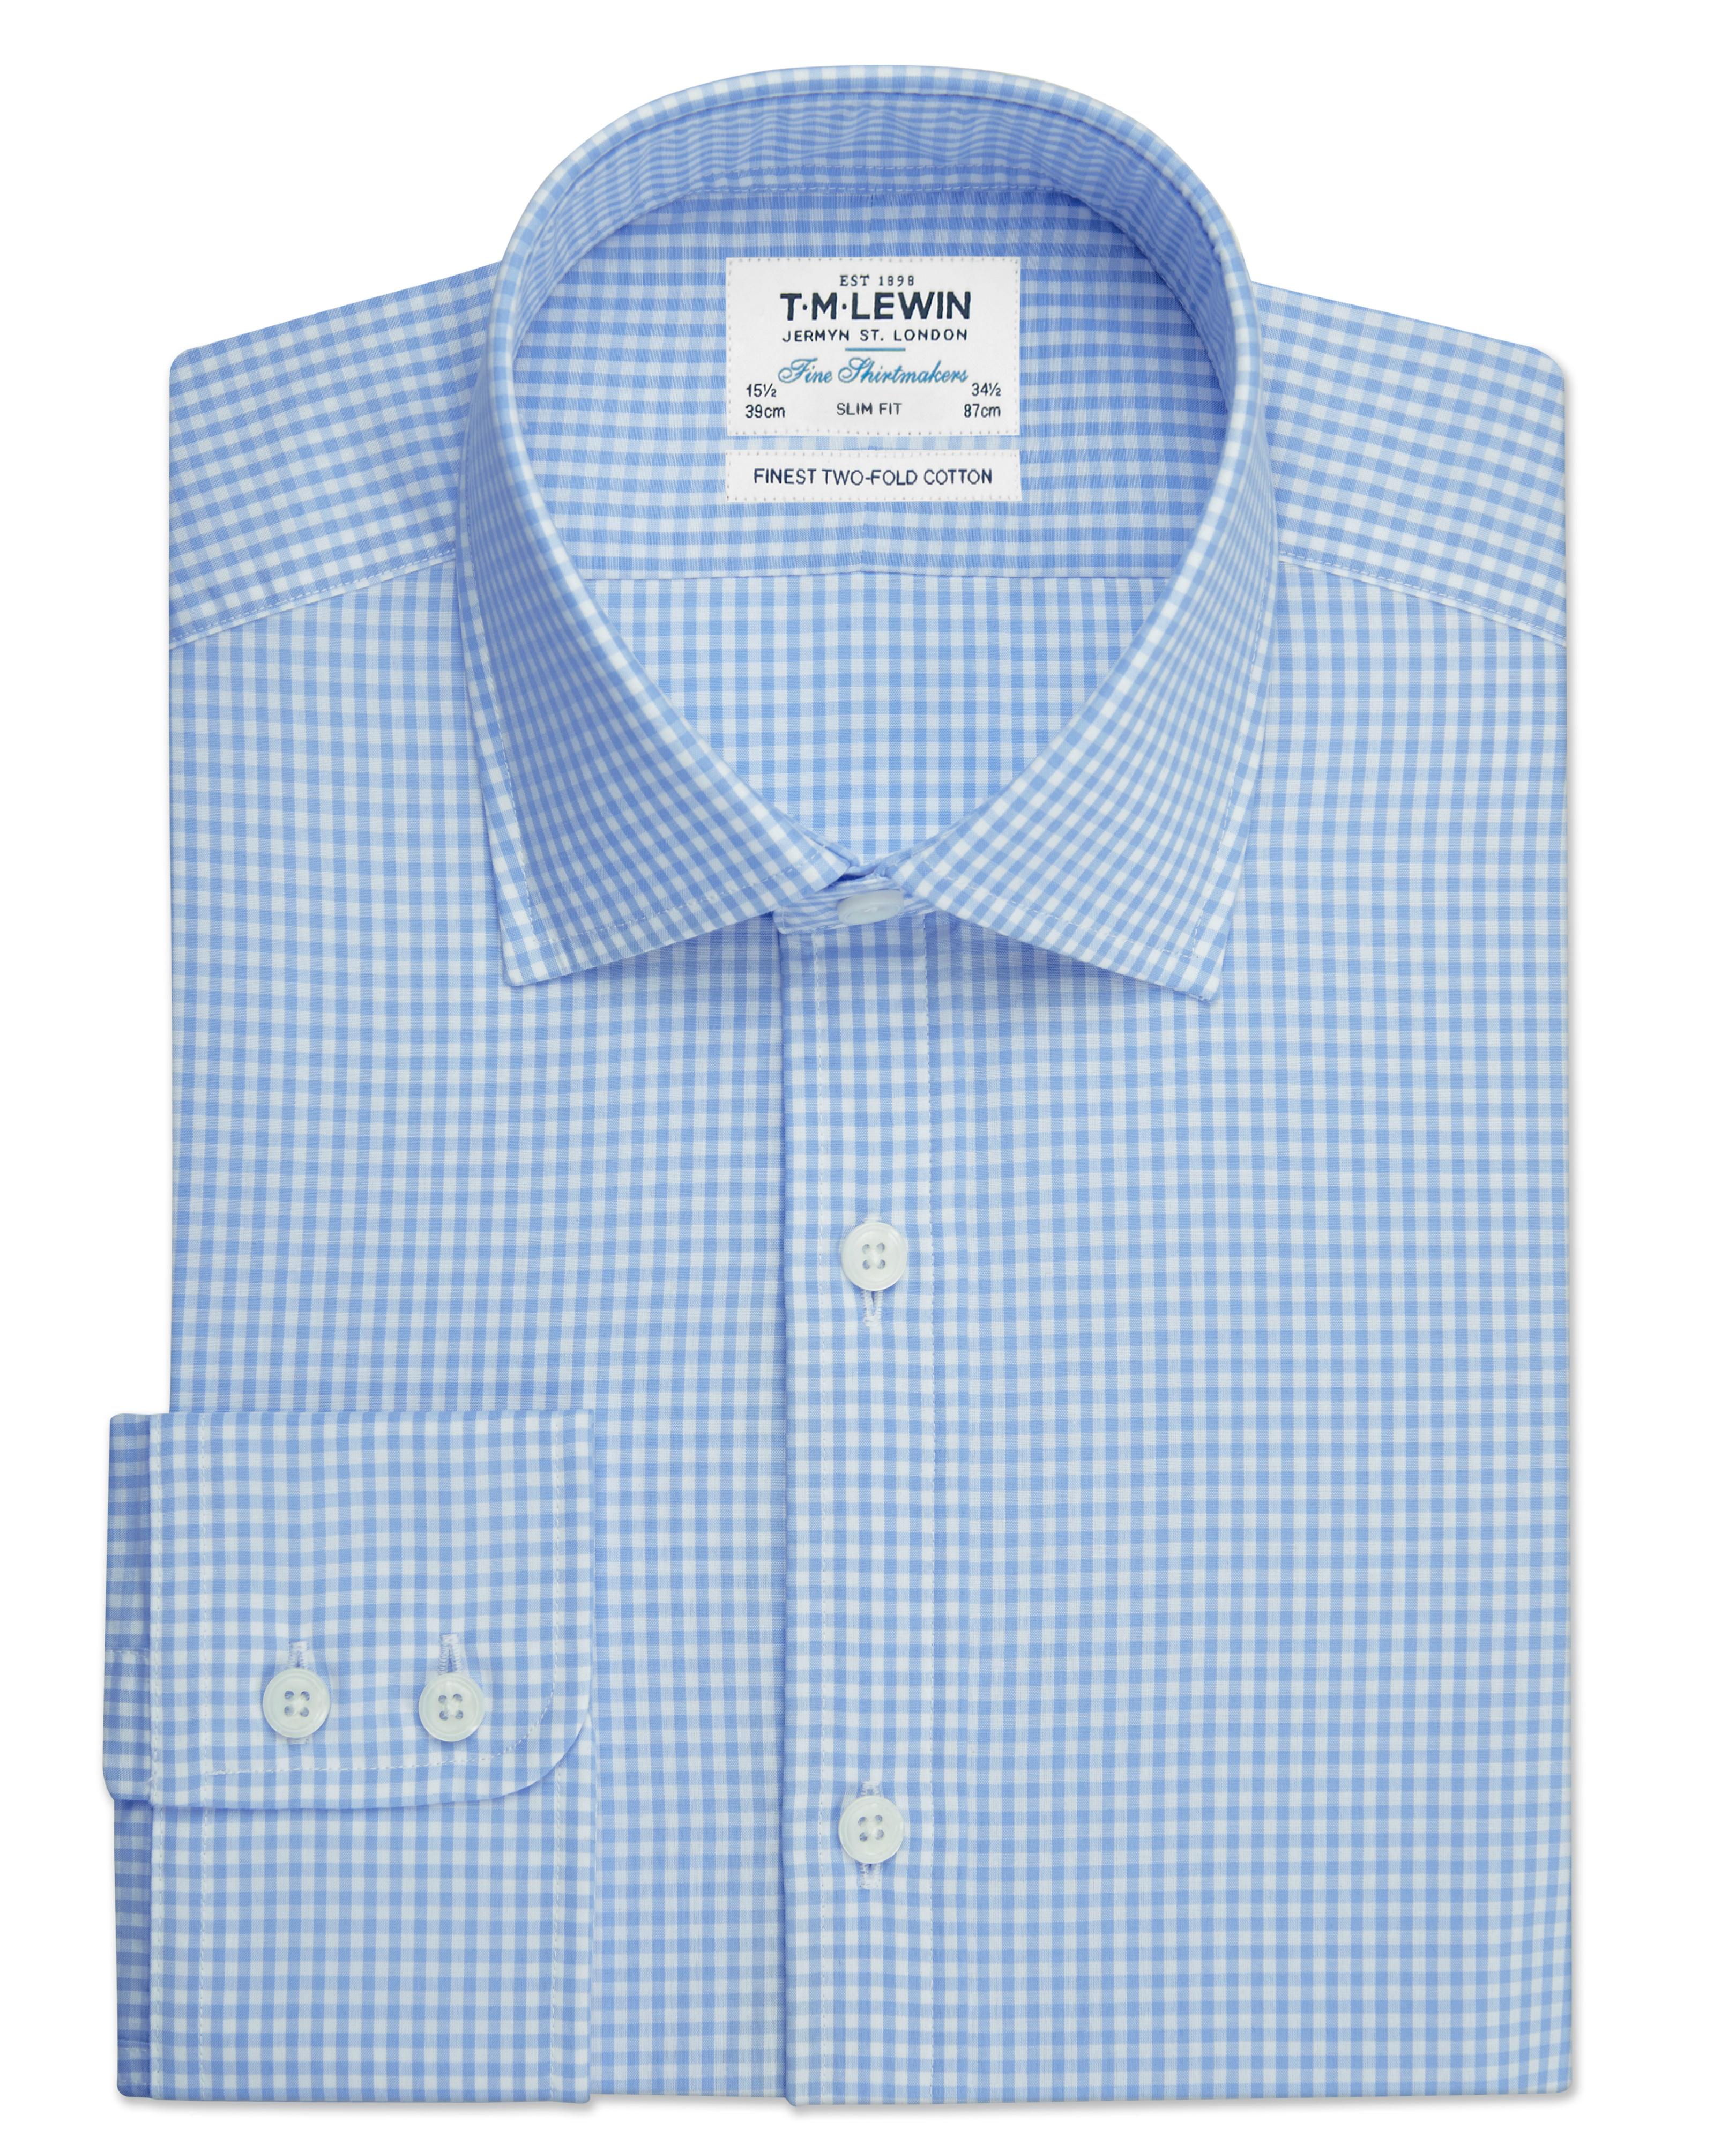 T.M.Lewin Mens Light Blue Gingham Slim Button Cuff Shirt